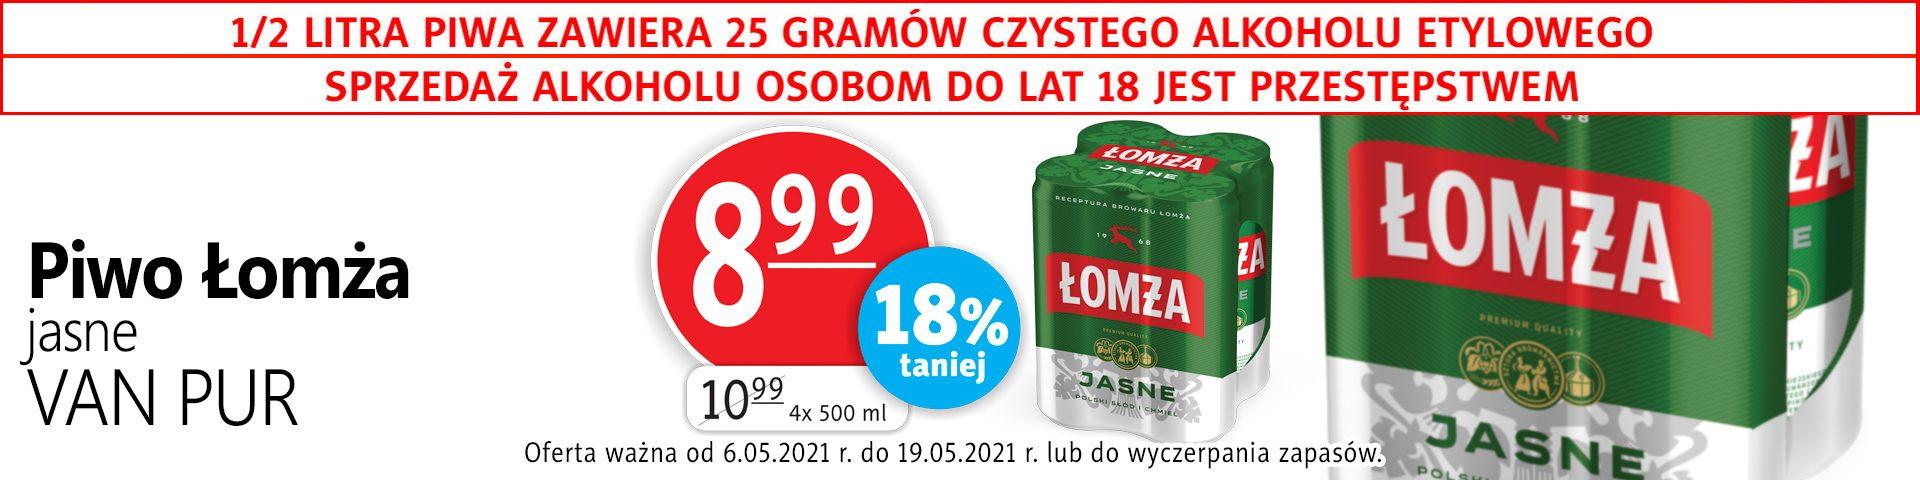 billbord_6_19_05_2021_lomza